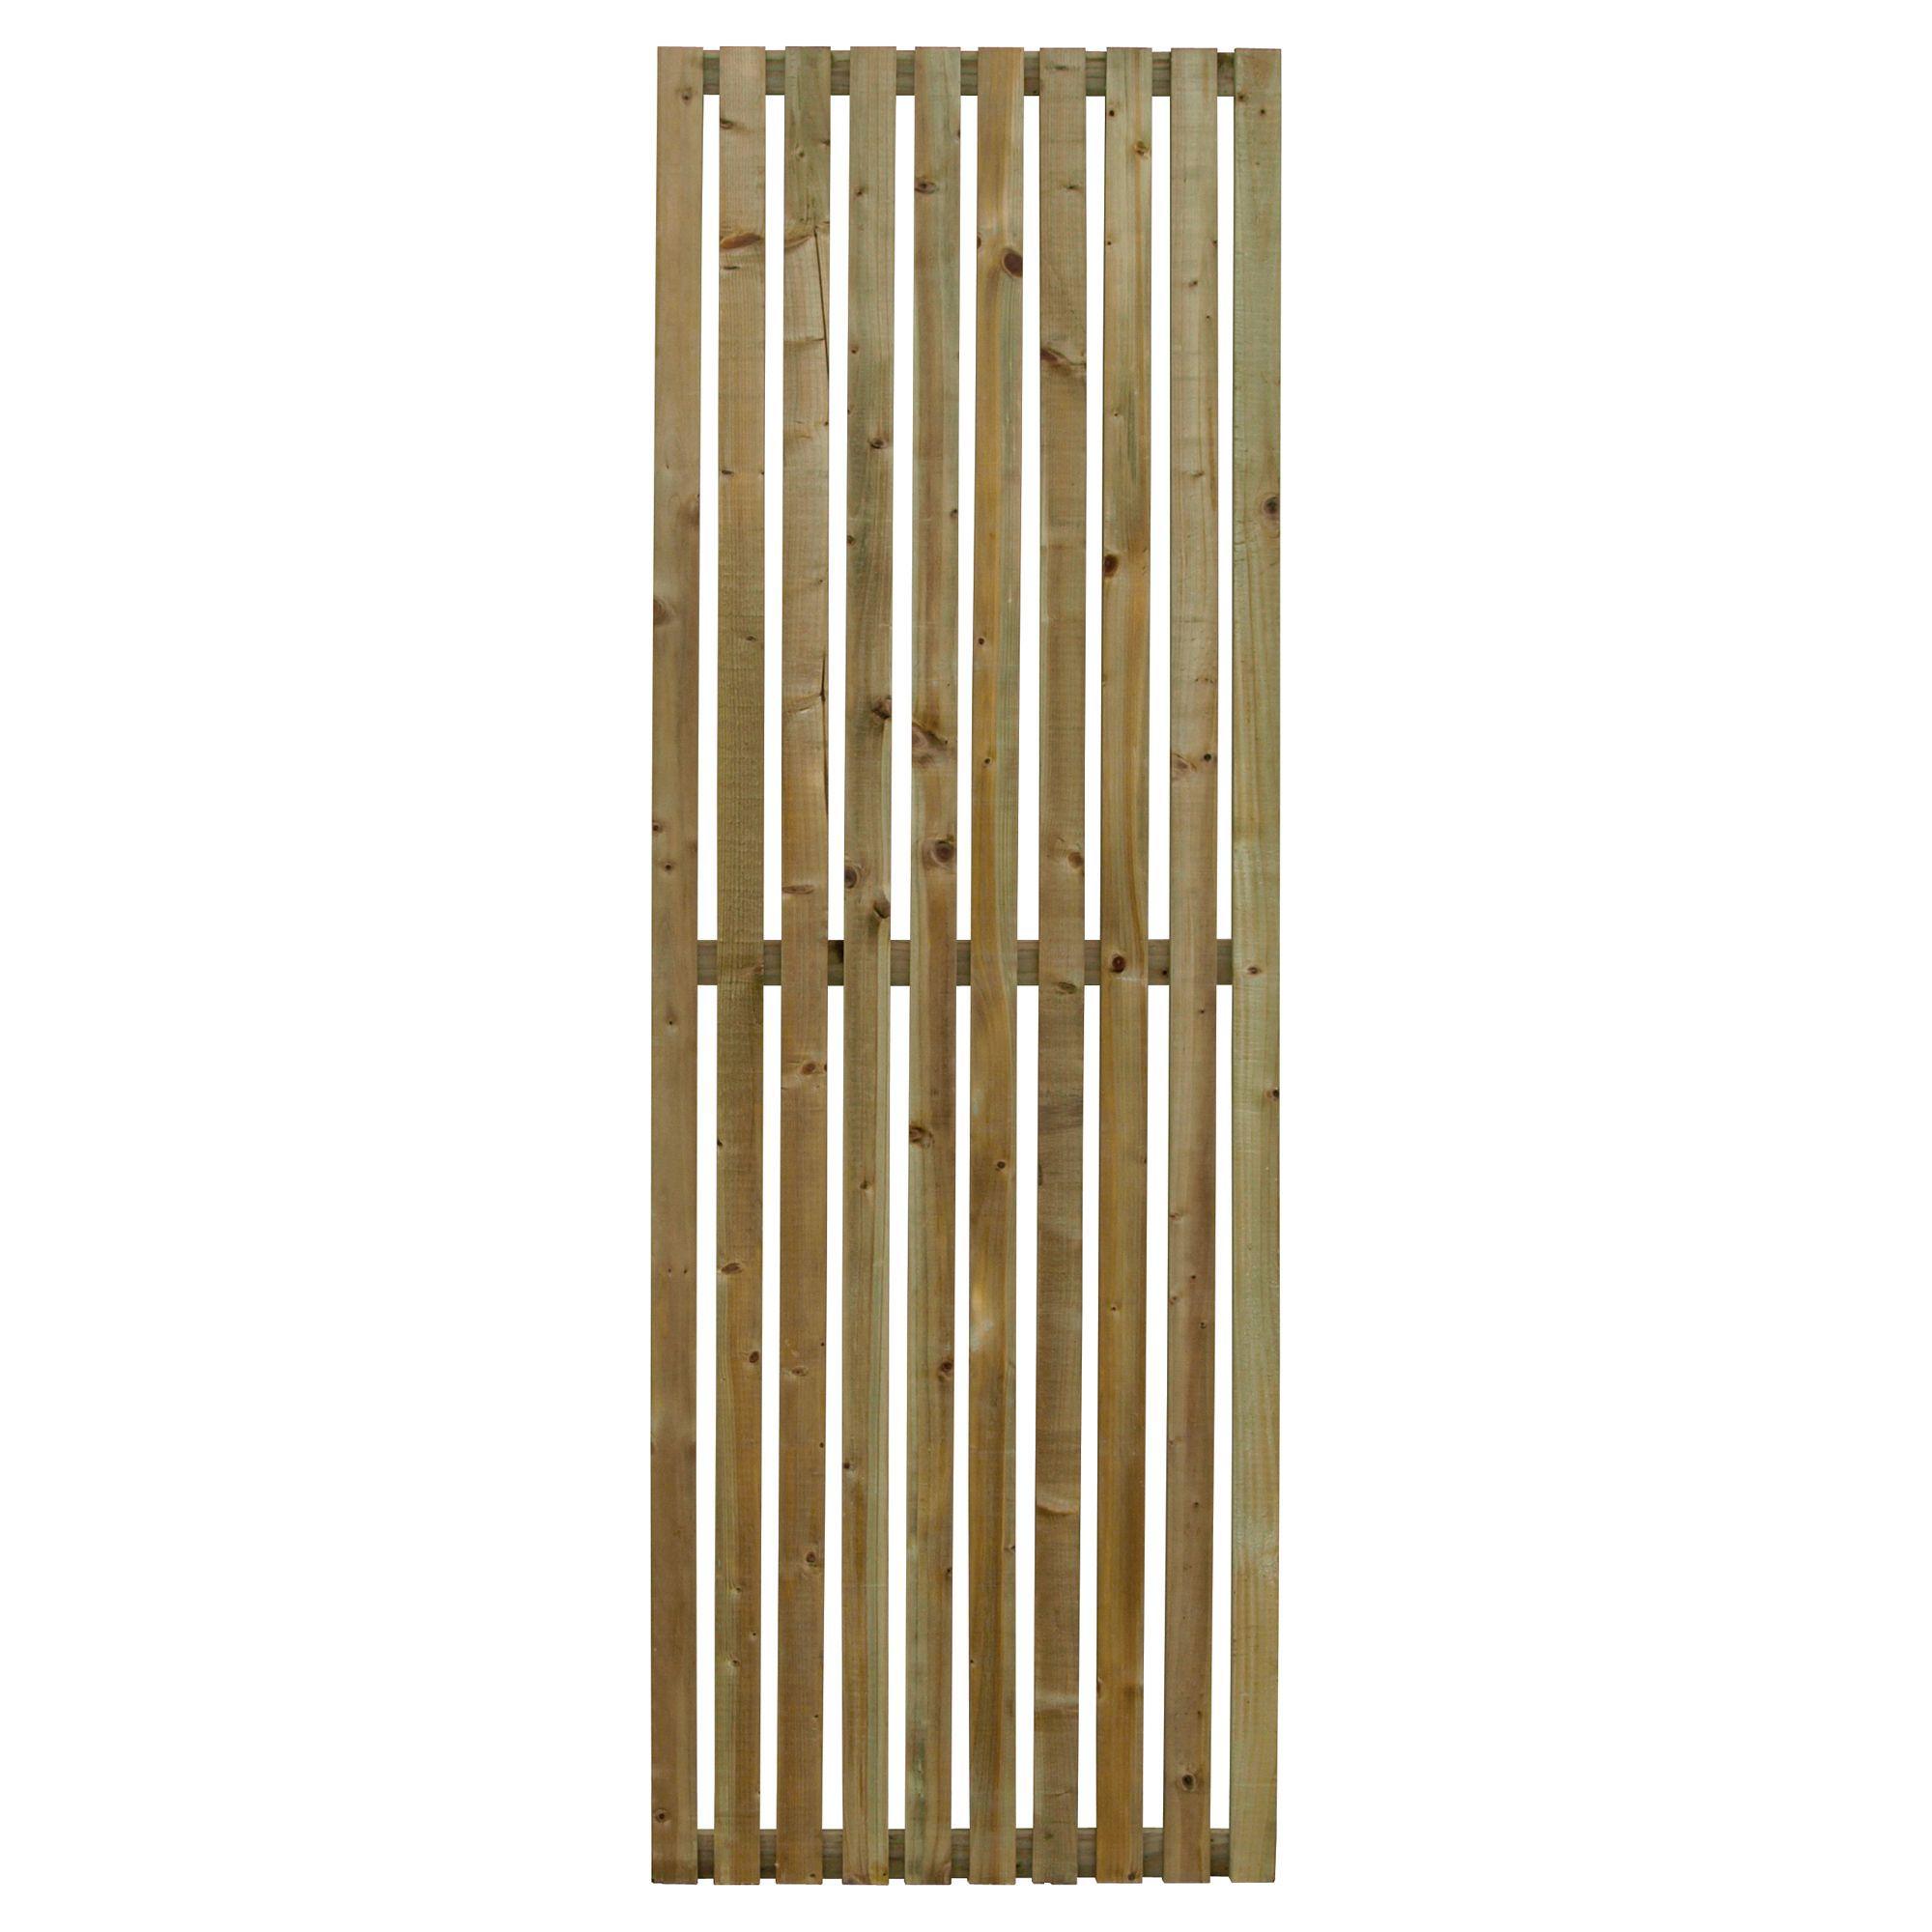 Linear Timber Garden Screen H 1 8 M W 0 6 M Of 3